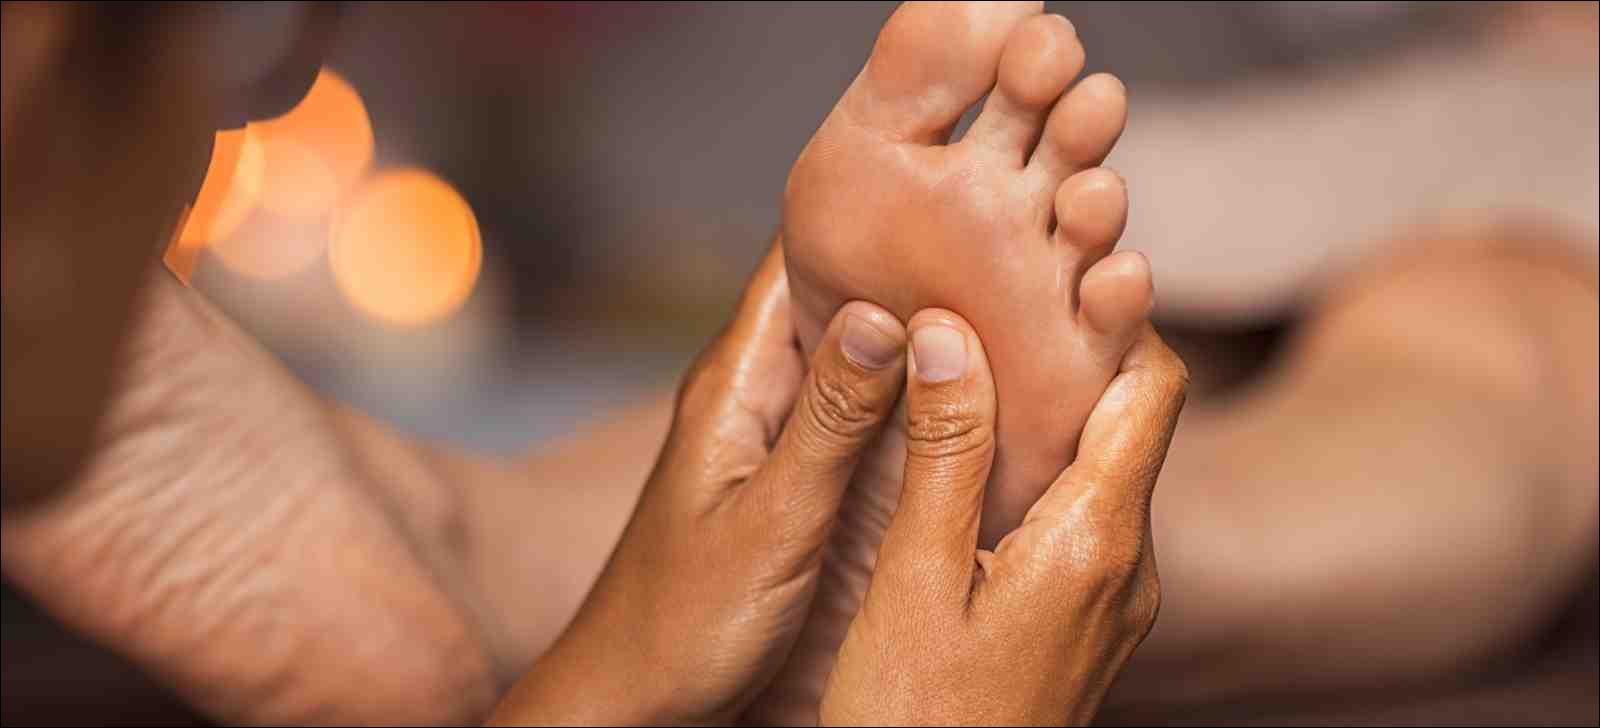 Closeup of masseuse doing foot reflexology to woman's foot